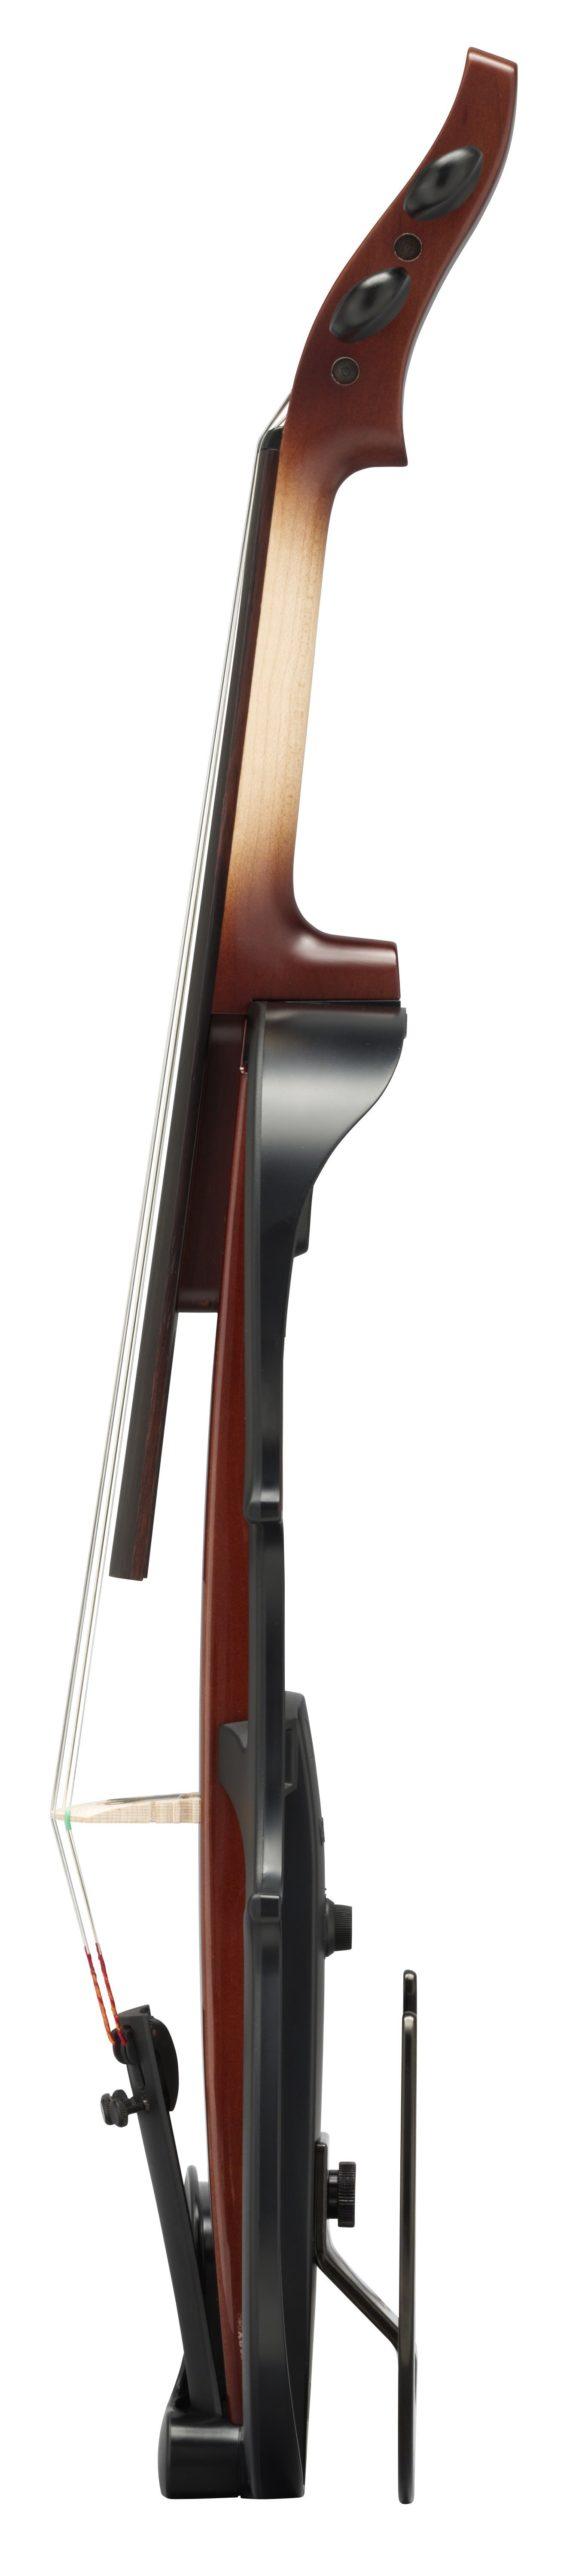 Yamaha YSV104 Silent Electric Violin